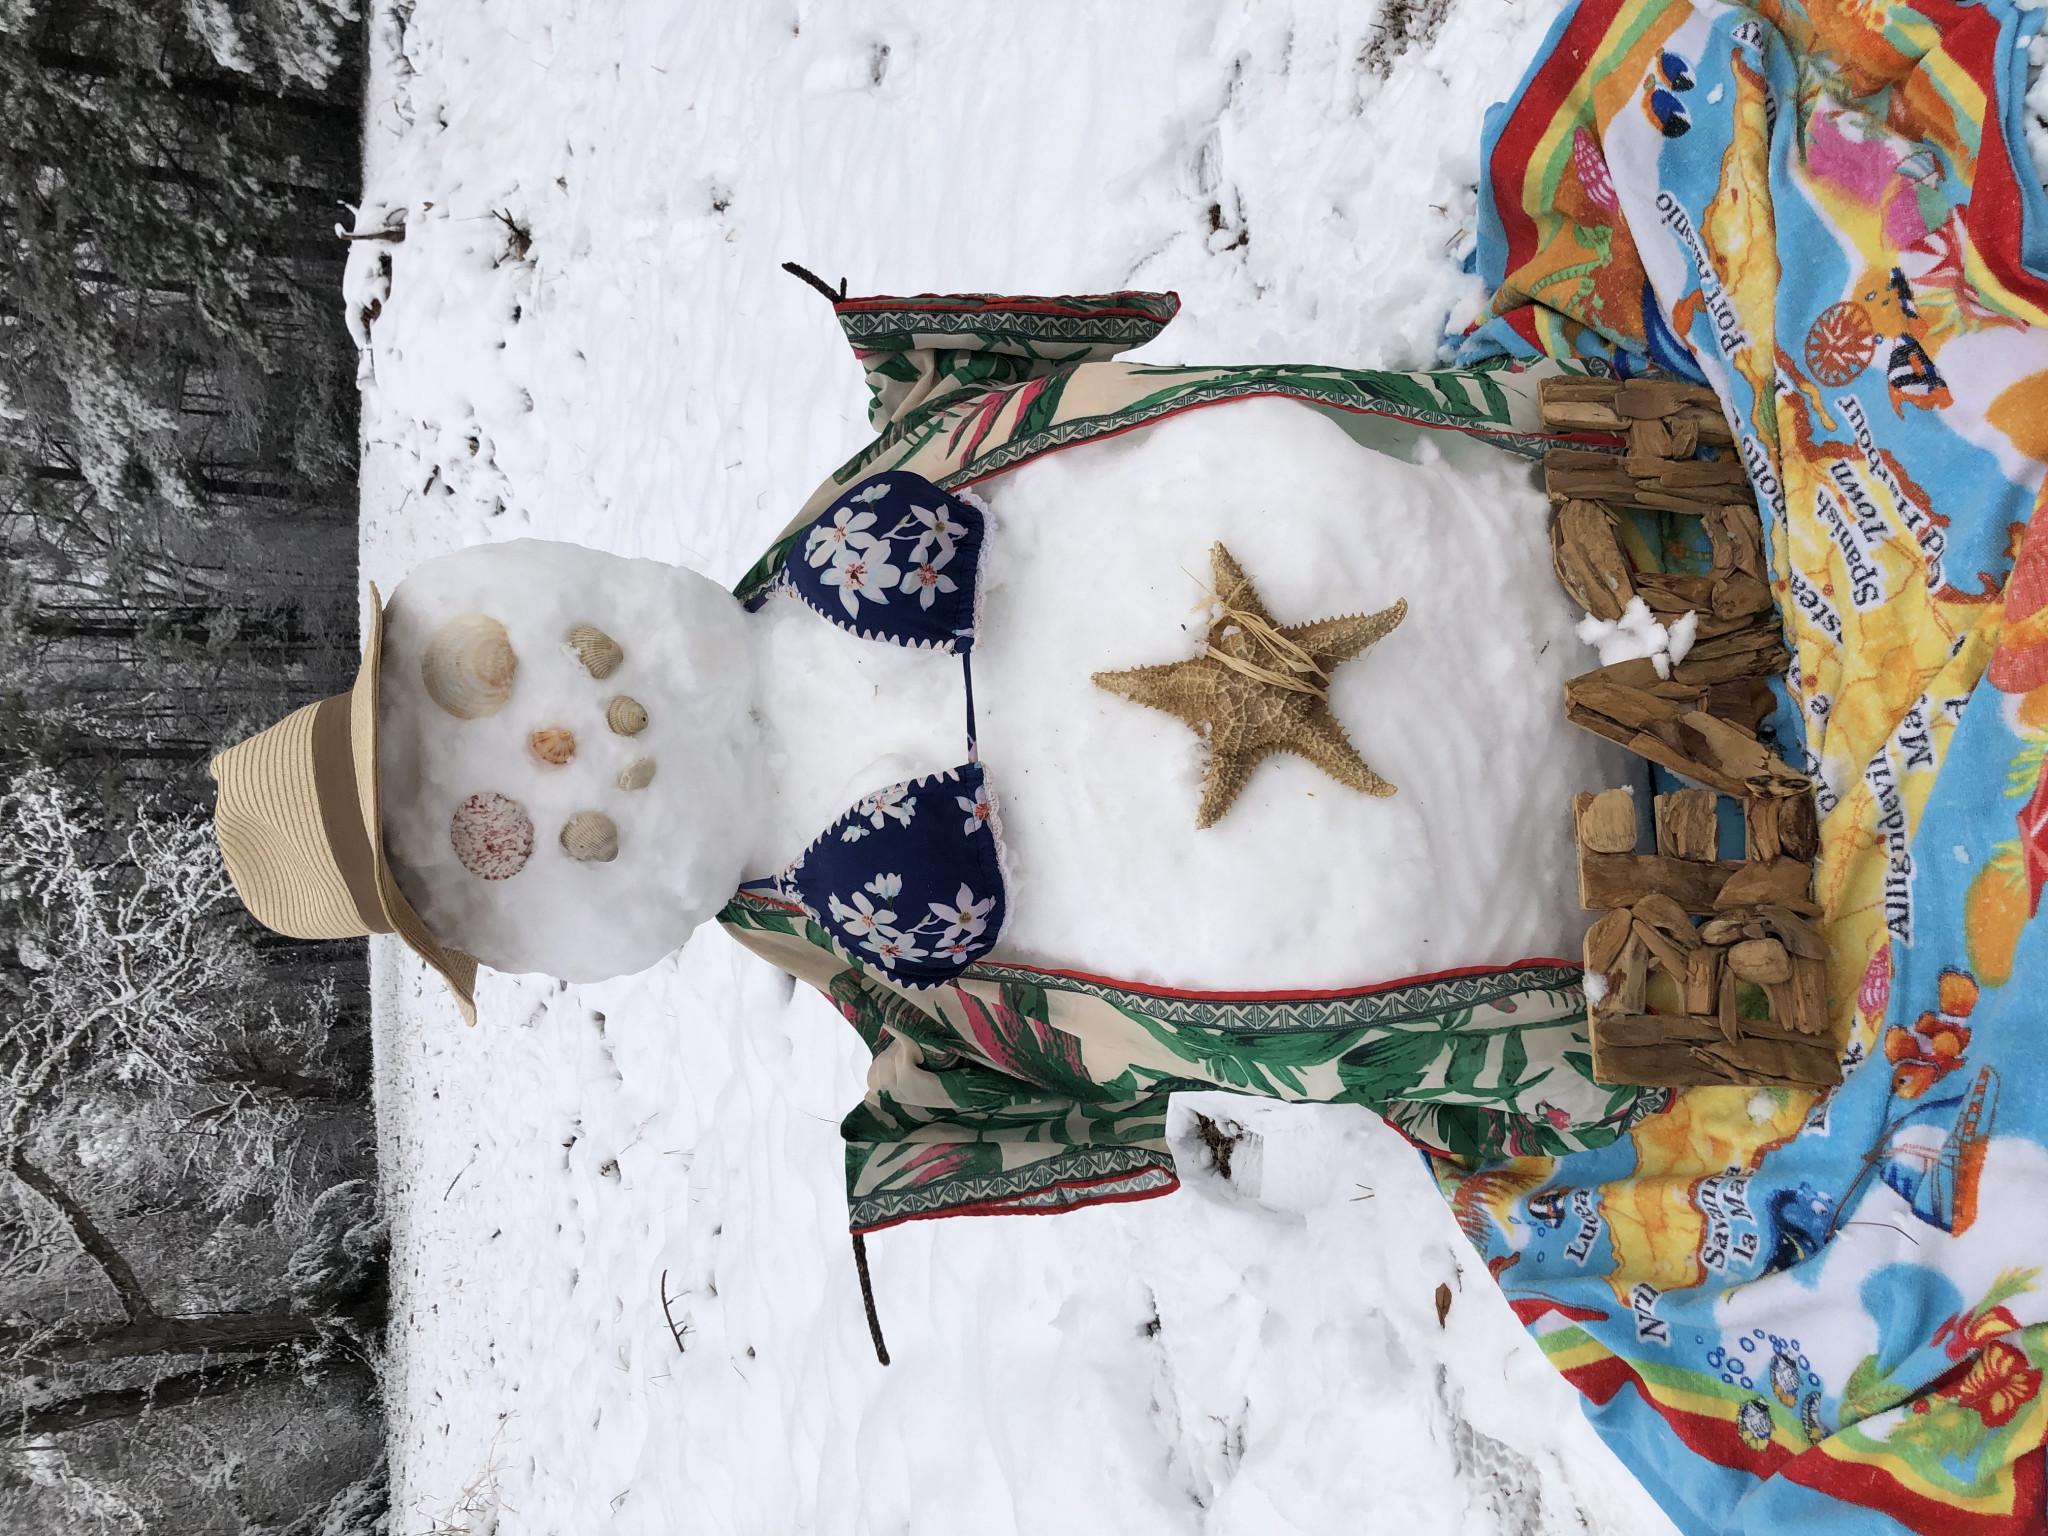 Flo the snowwoman needs a beach, by Scarlett Burch (photo uploaded sideways)